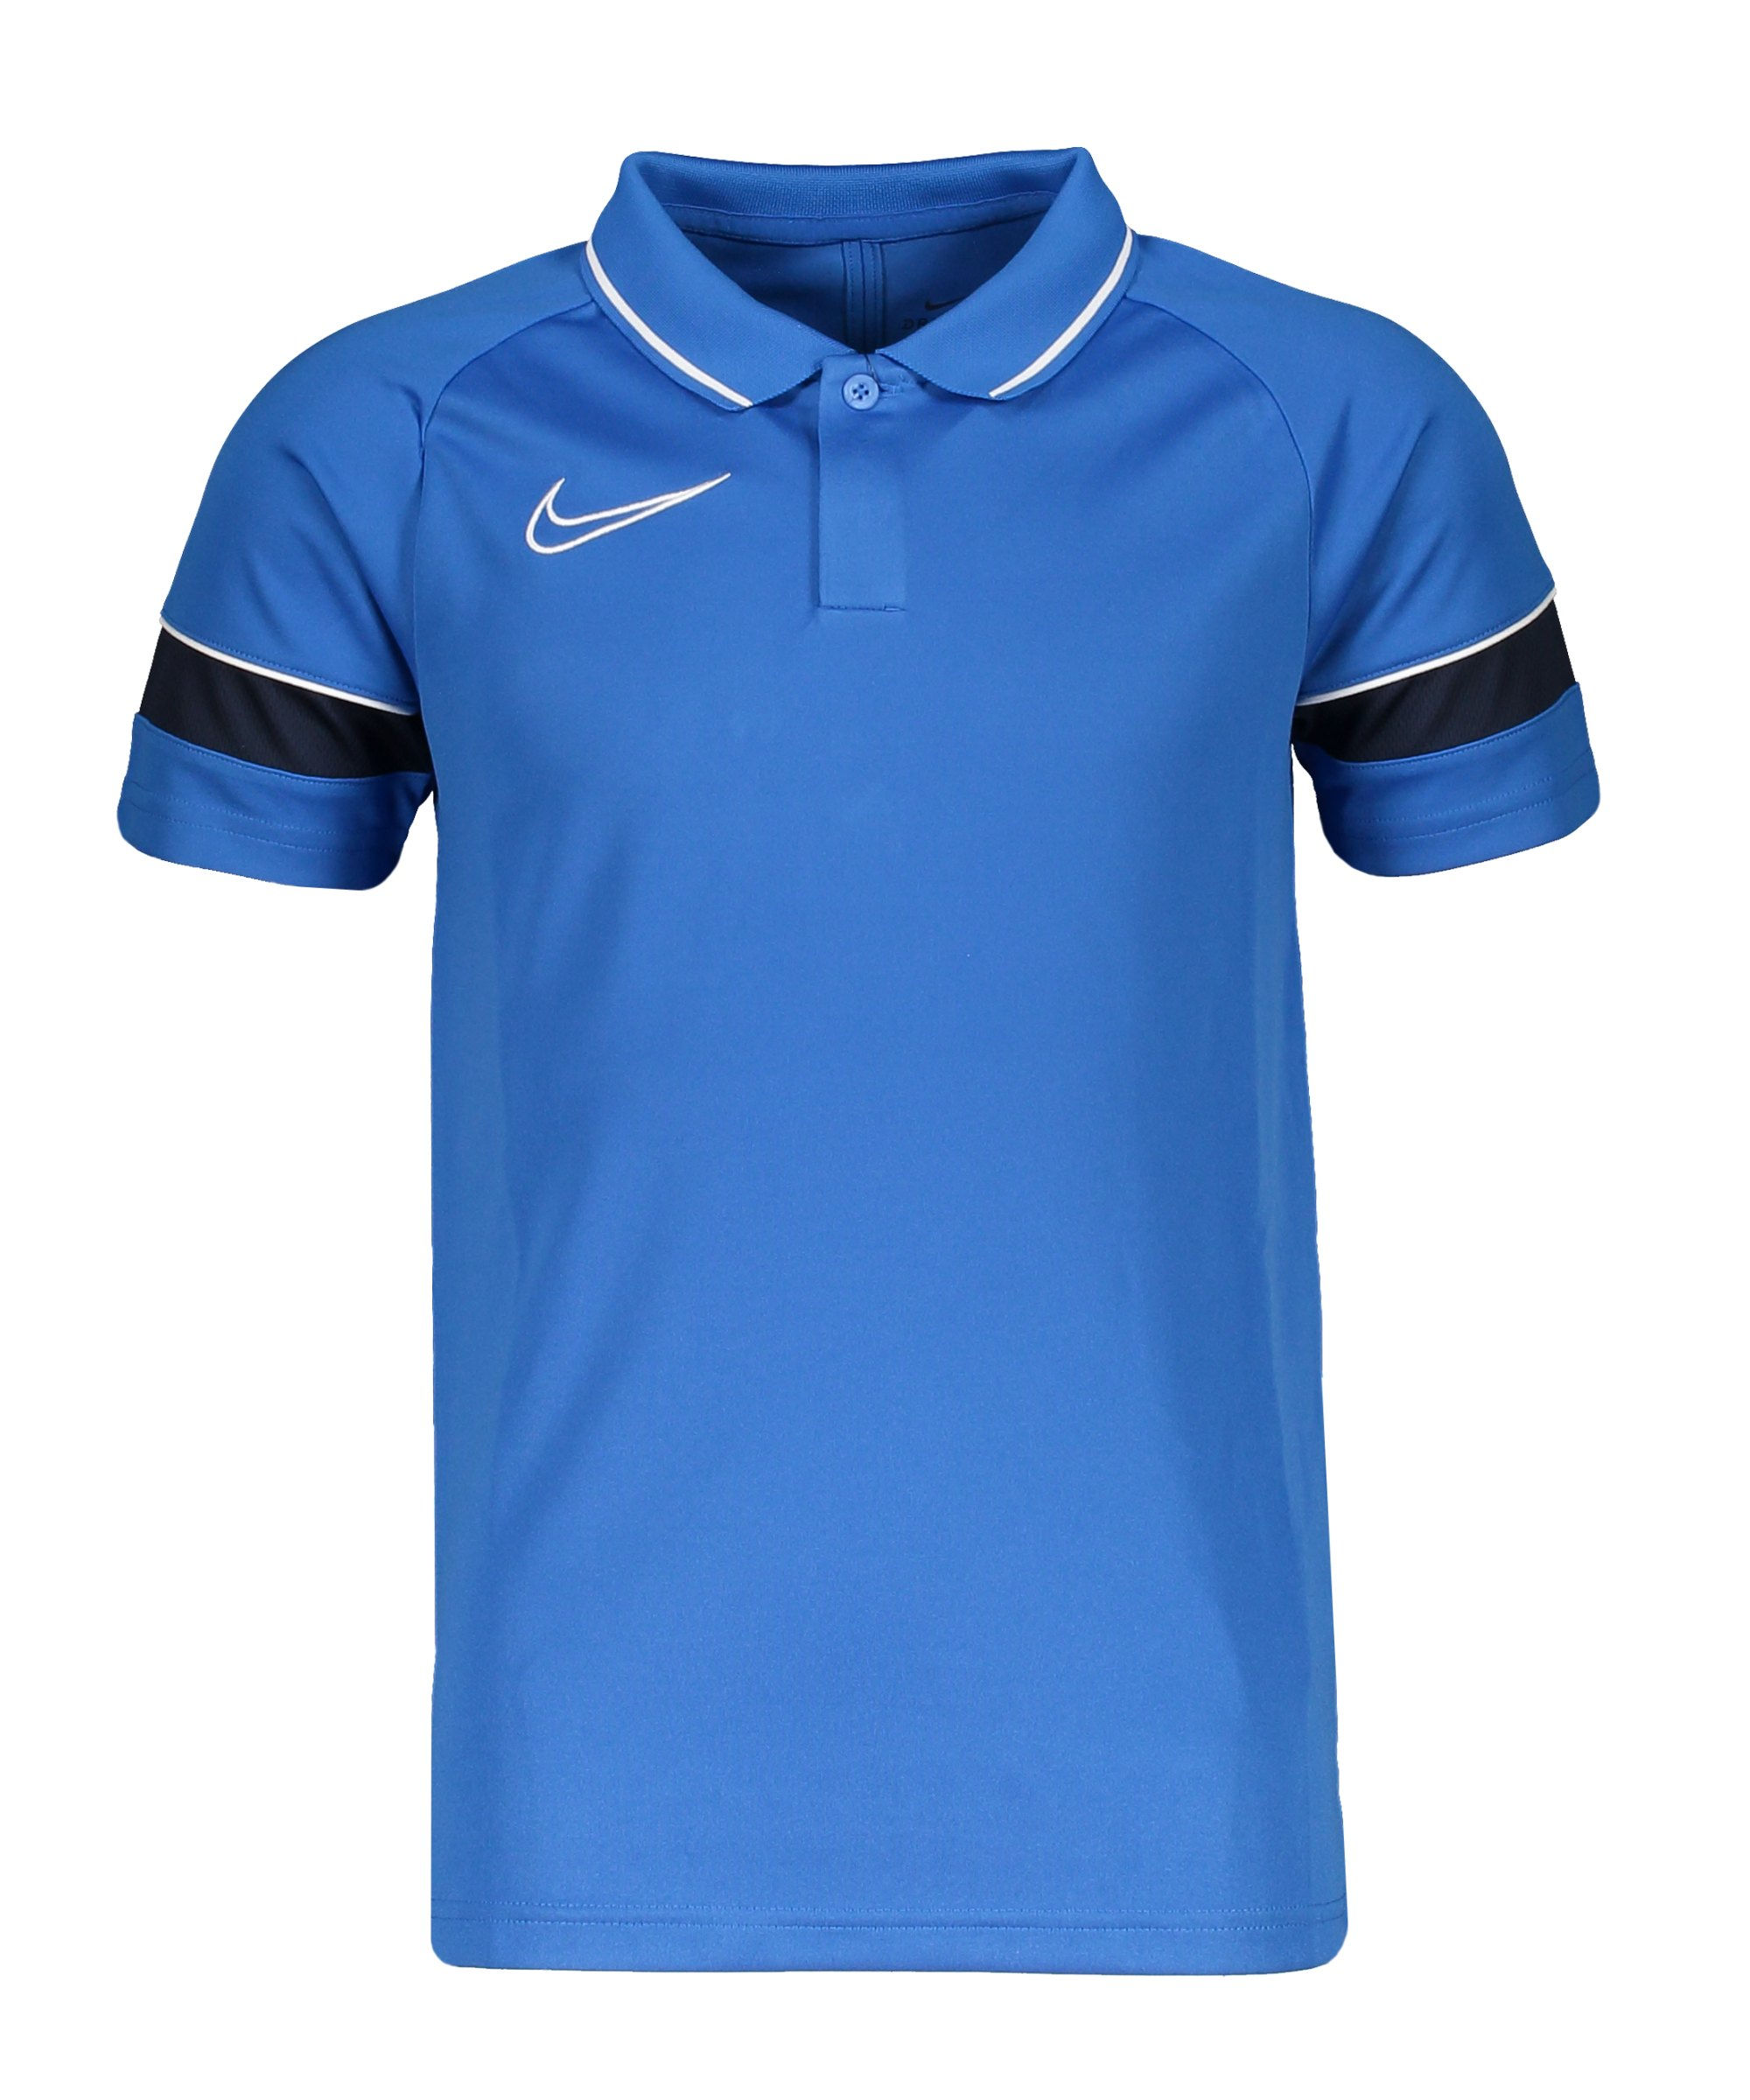 Nike Academy 21 Poloshirt Kids Blau Weiss F463 - blau